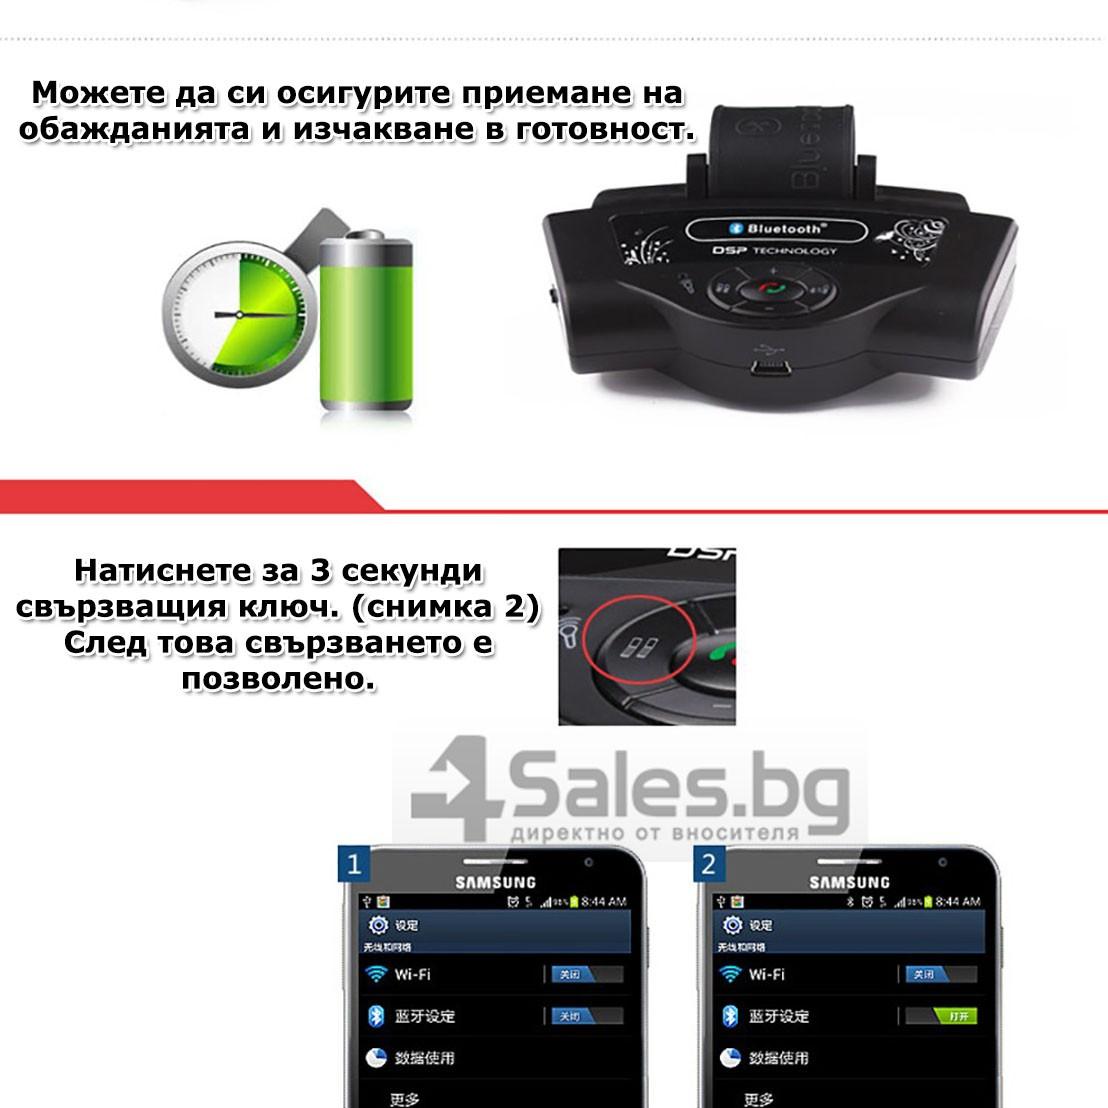 Bluetooth handsfree свободни ръце за волан на автомобил с високоговорител HF1 17